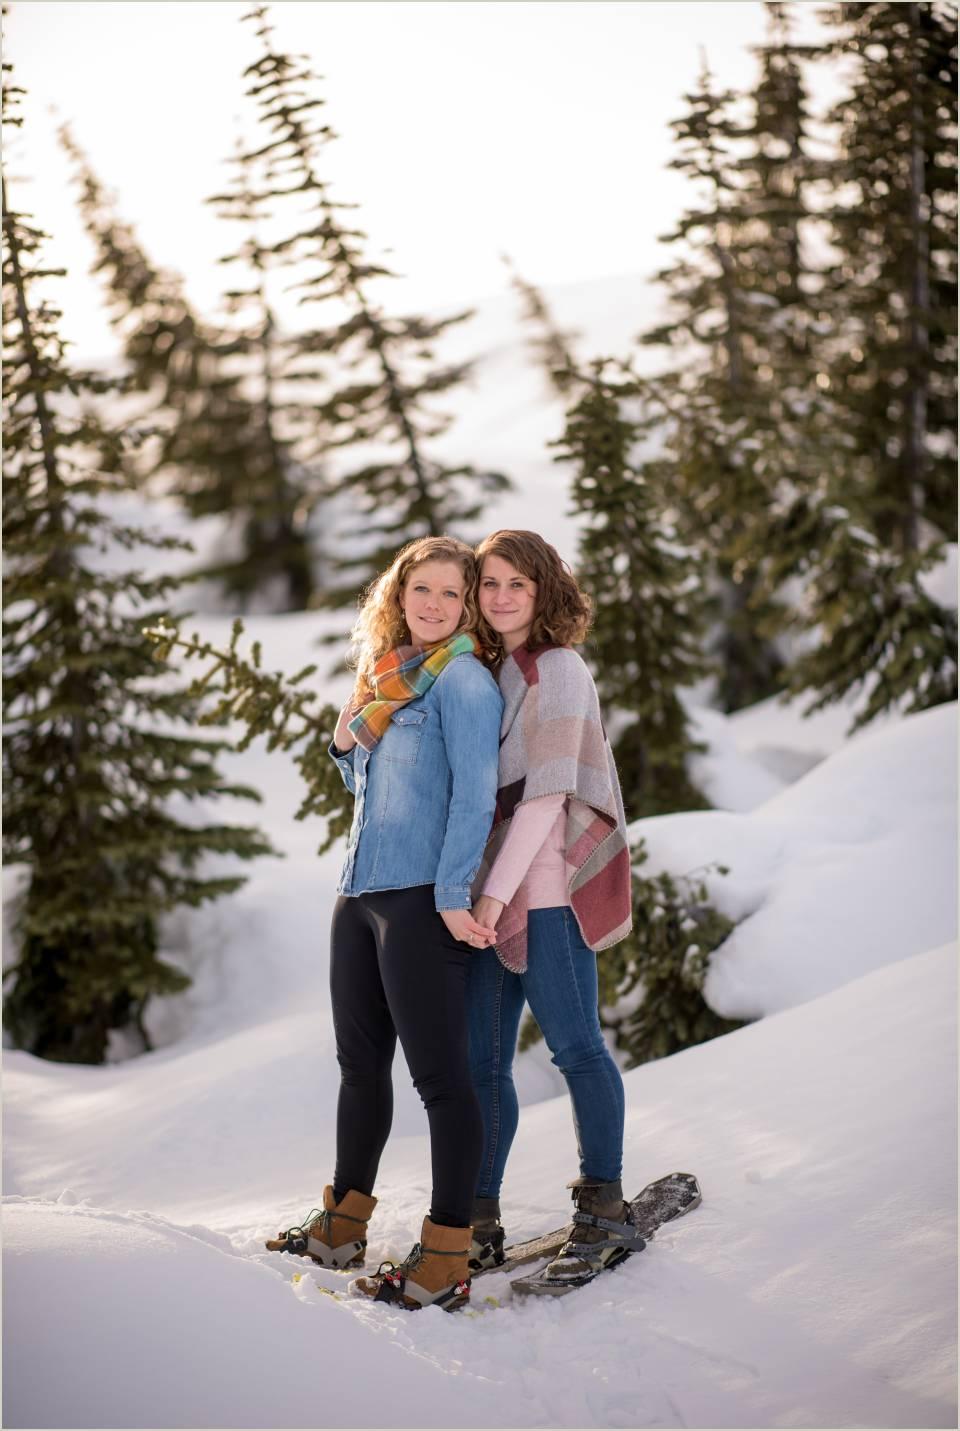 winter same sex engagement photos at mount rainier